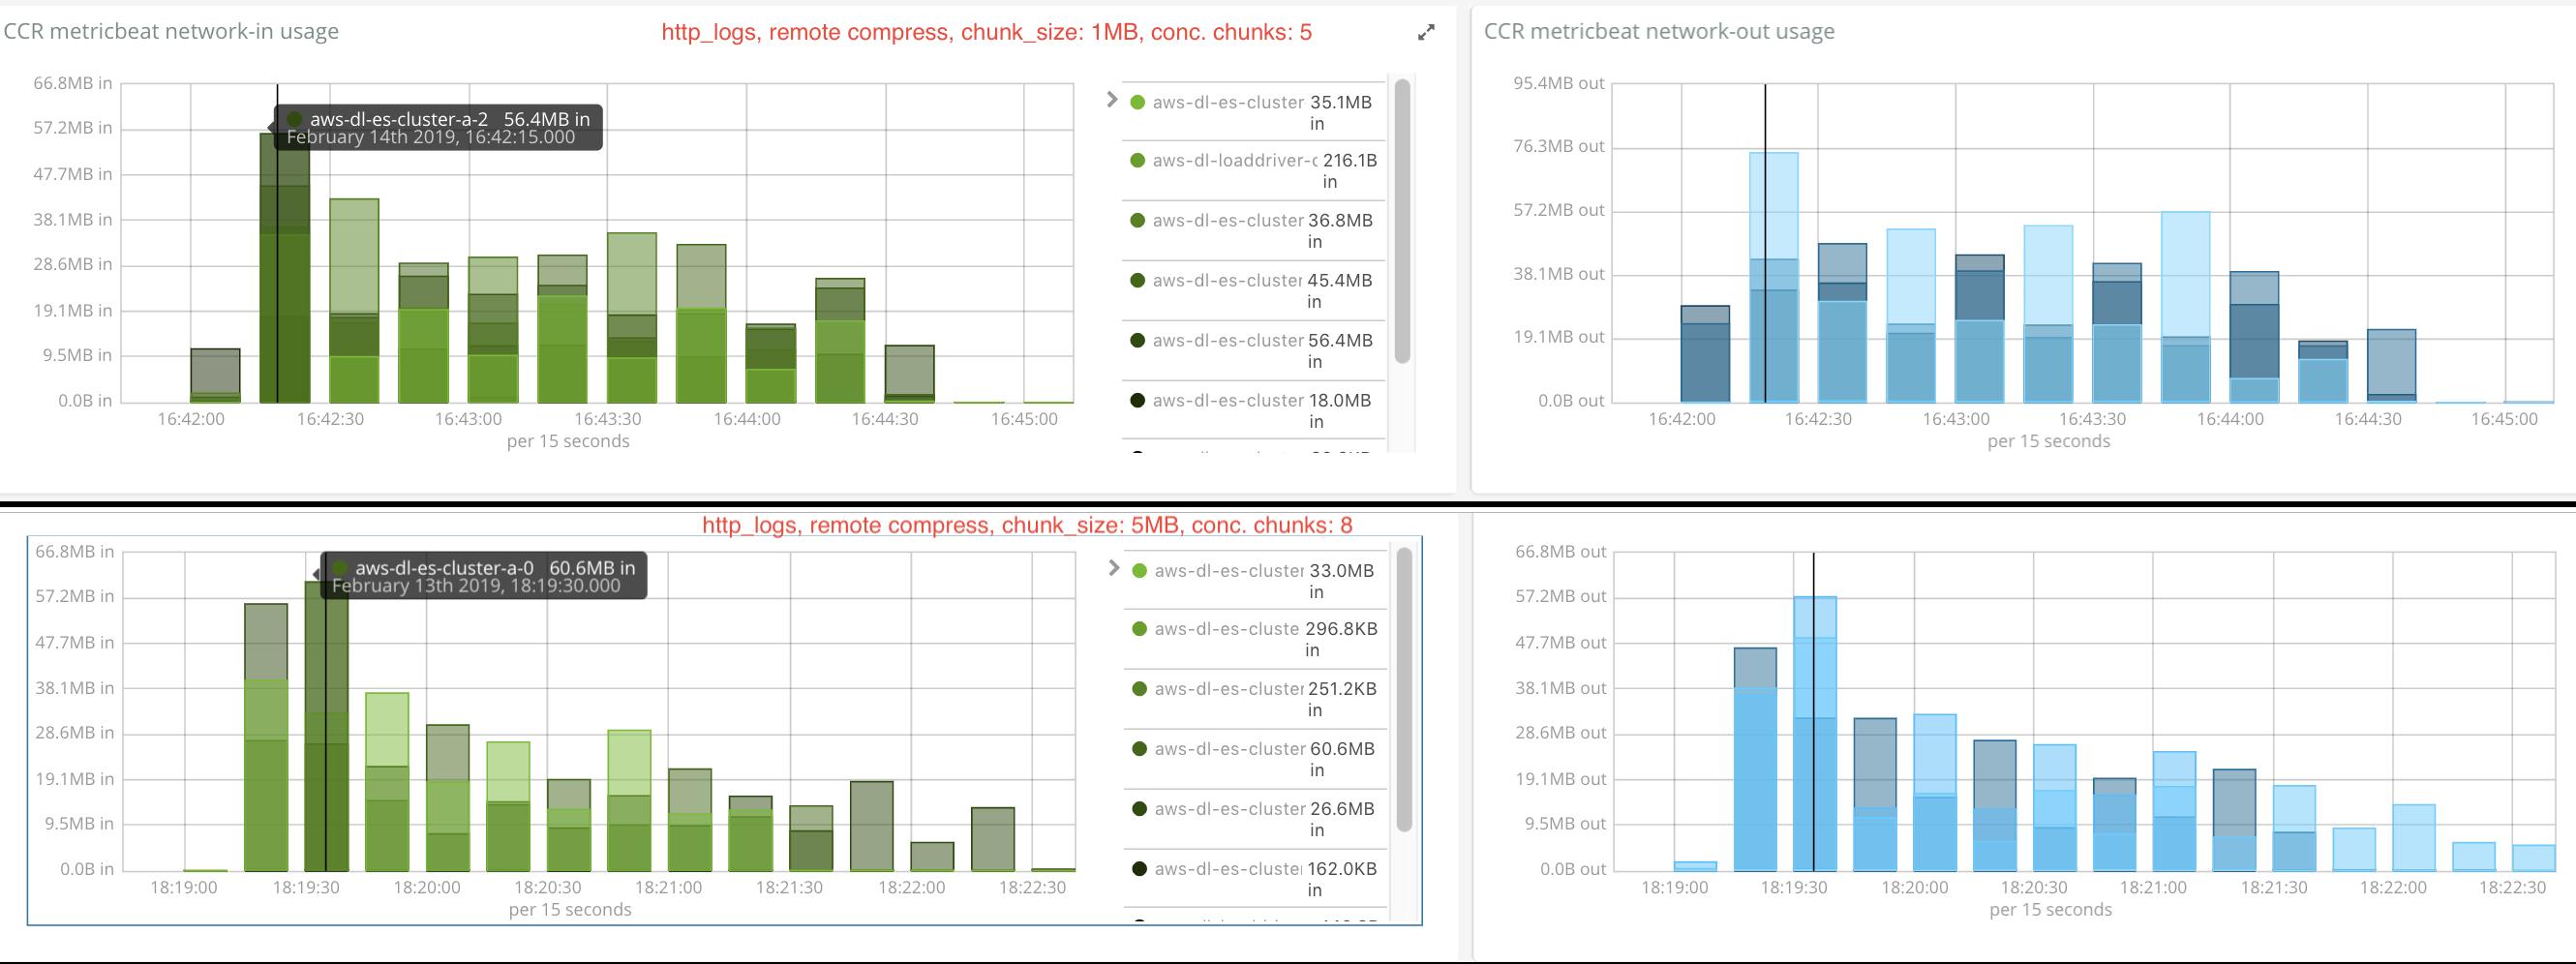 http_logs_remotecompress_network_usage_1mb_5conc-vs-5mb_8conc